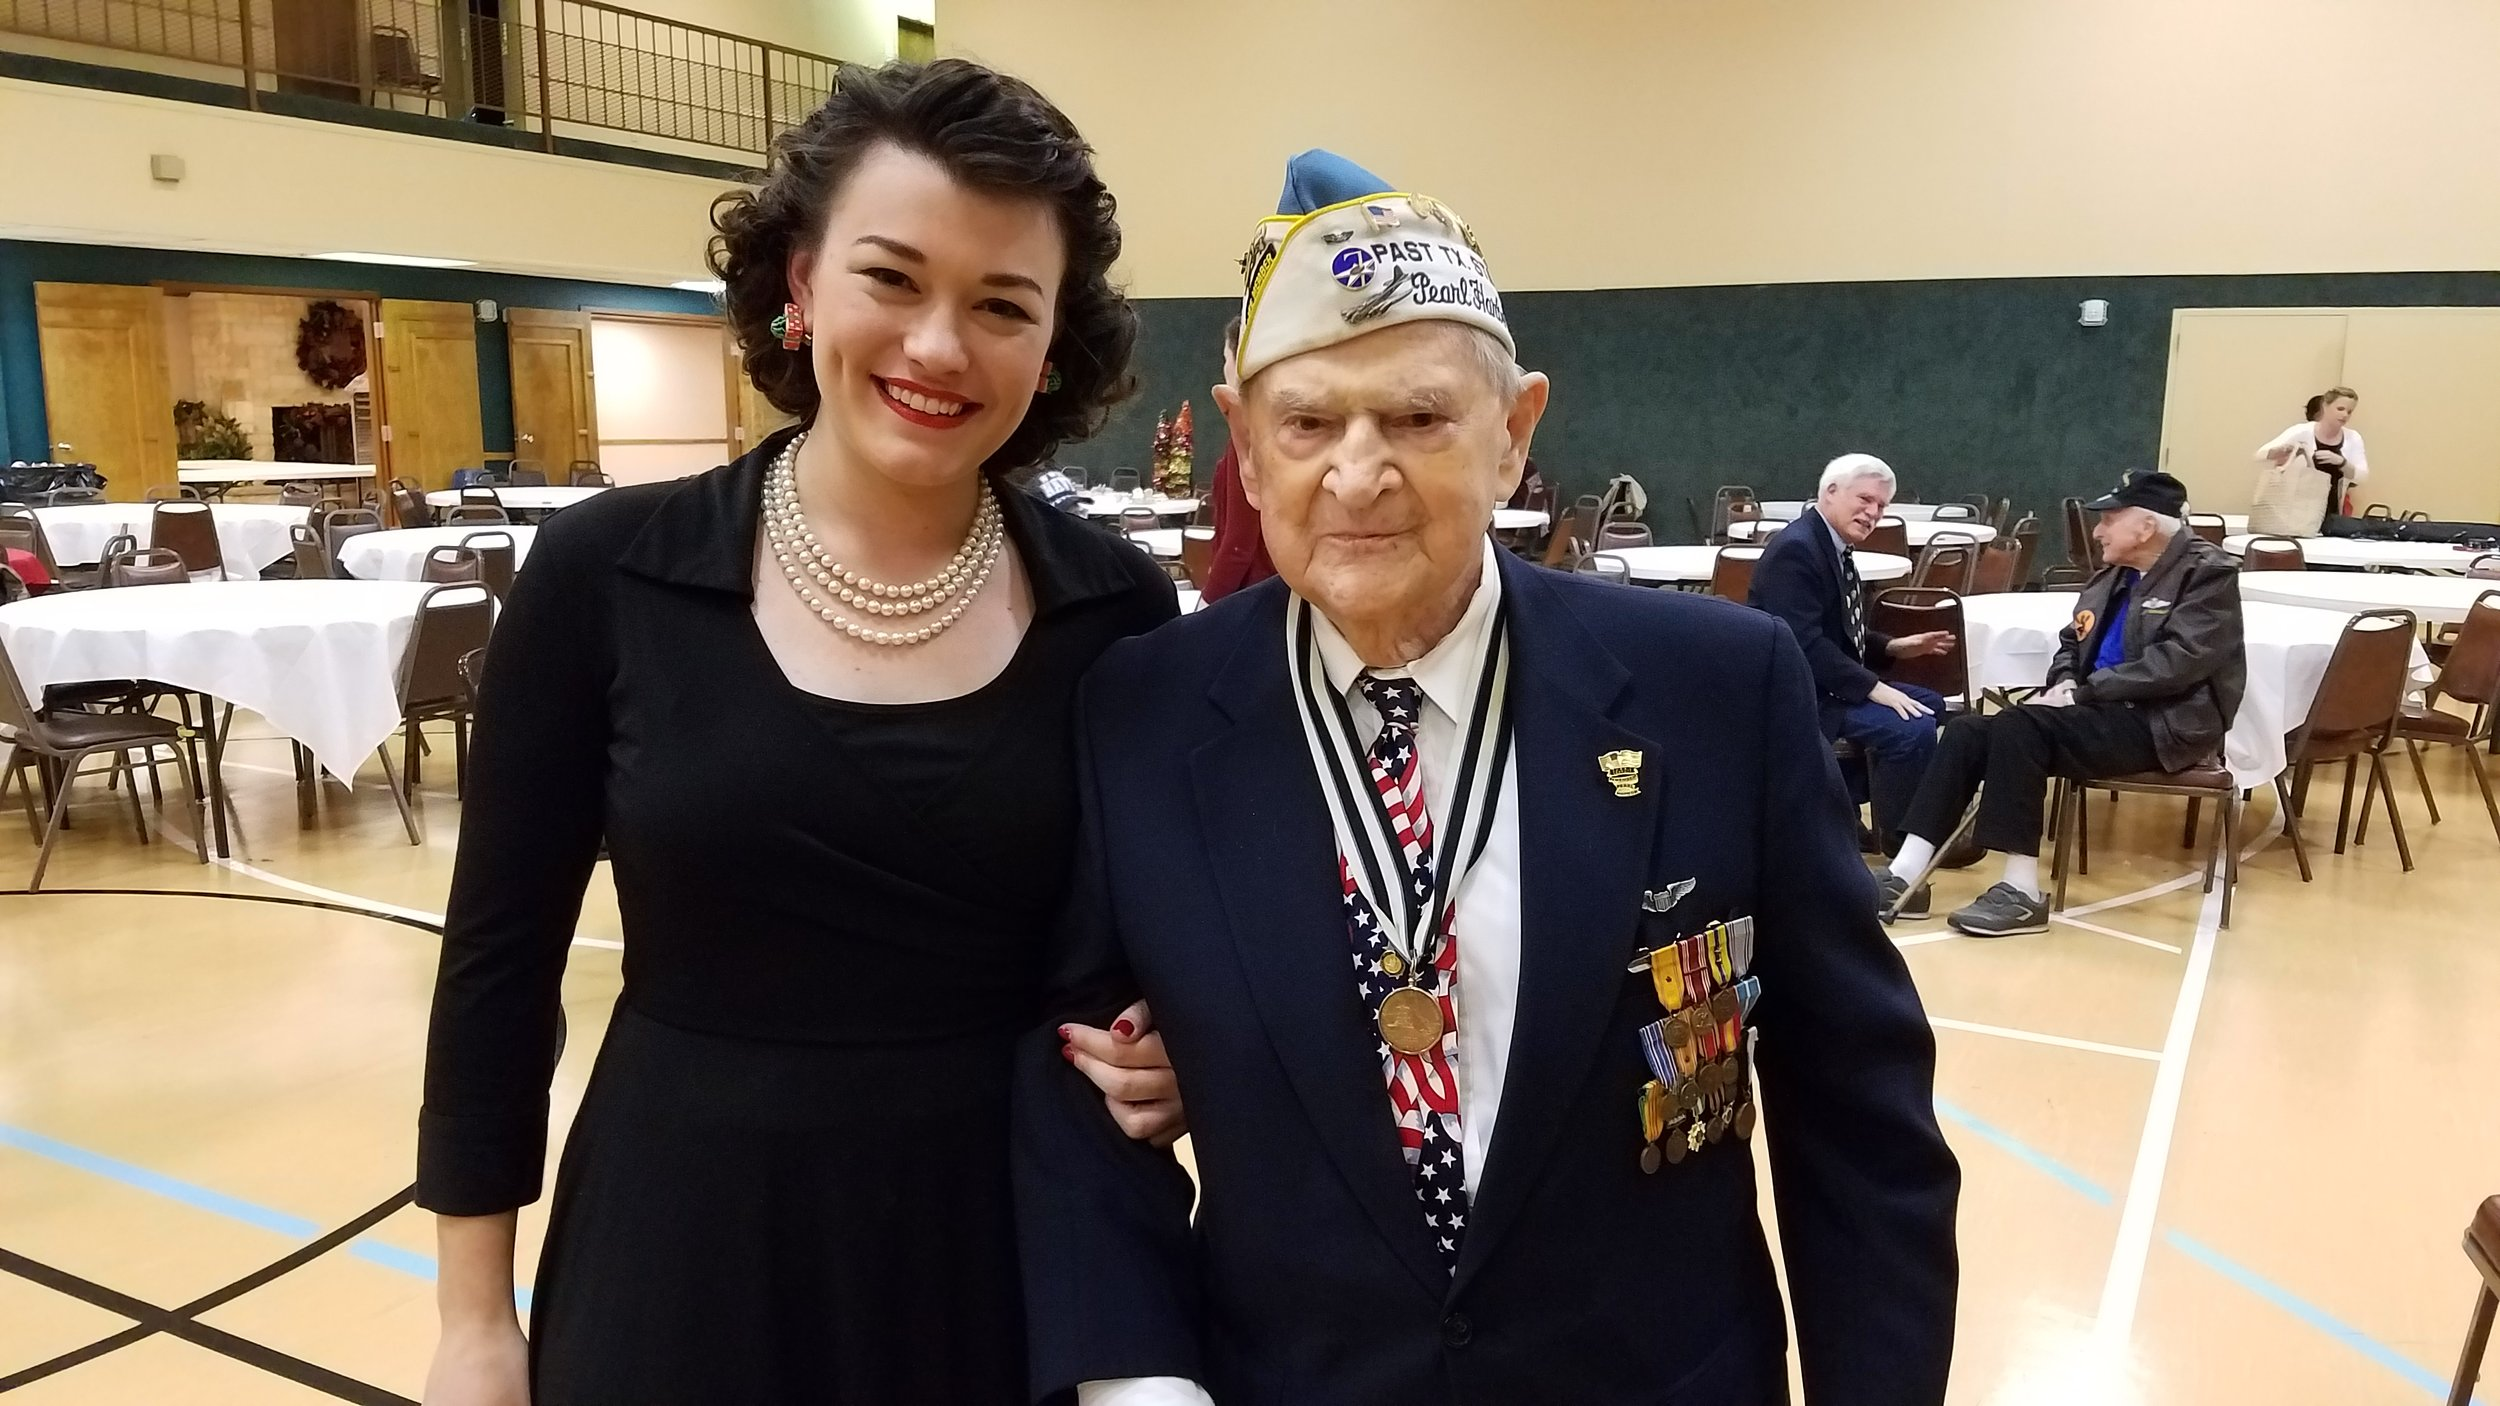 Jubilee and Pearl Harbor Survivor Robert Tanner